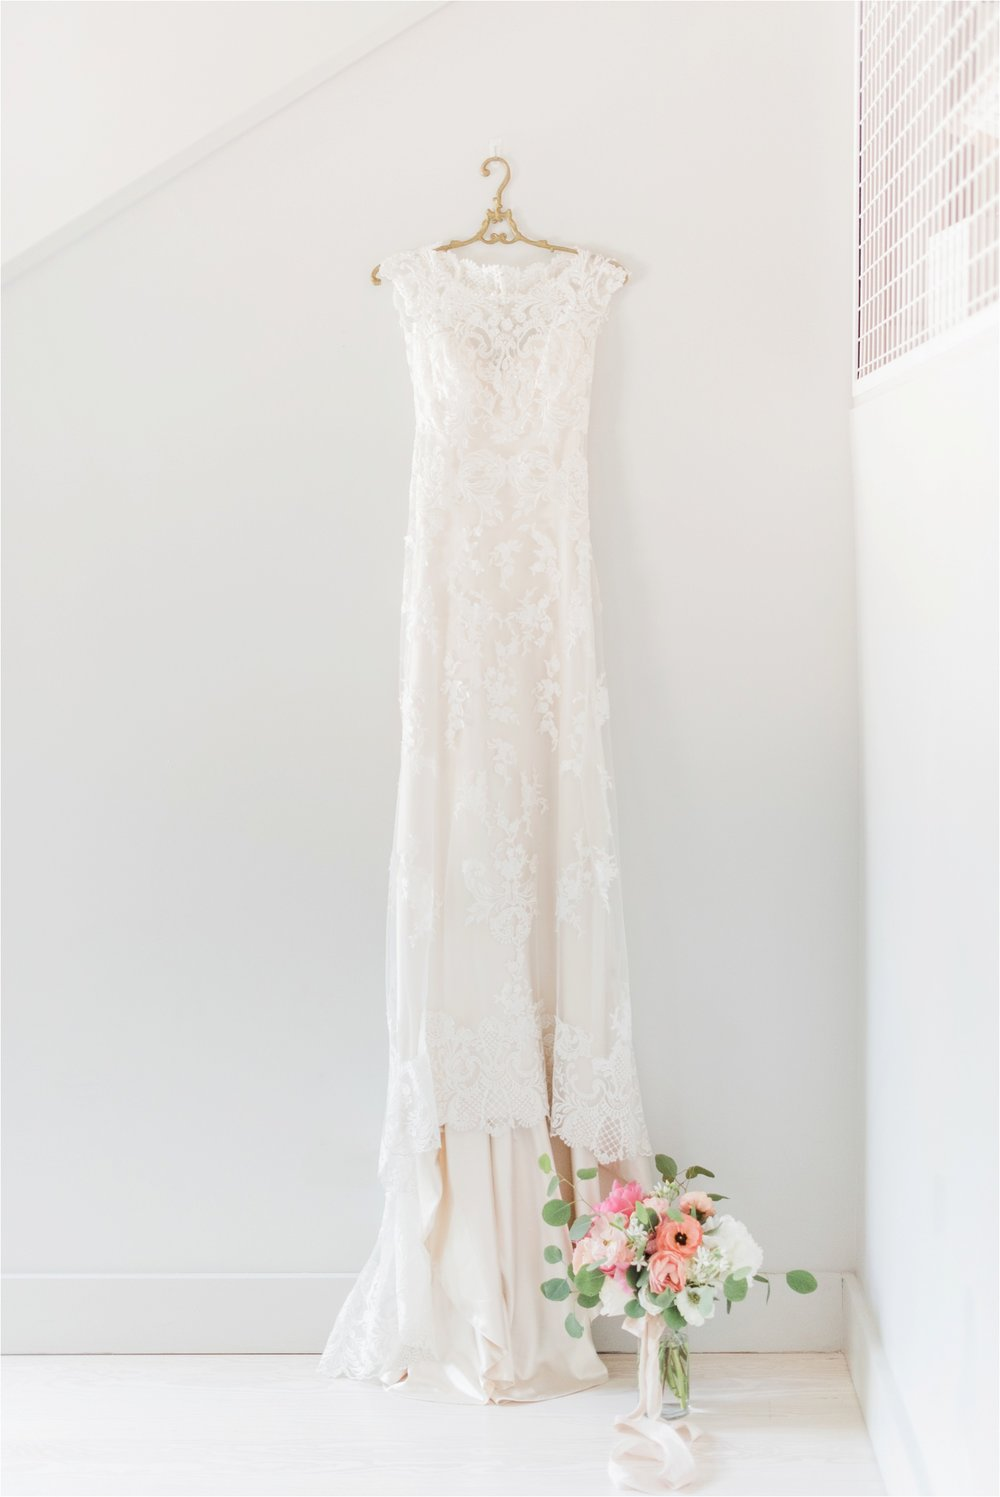 virginia-wedding-photographer-theoverlook-wedding-photo_0113.jpg